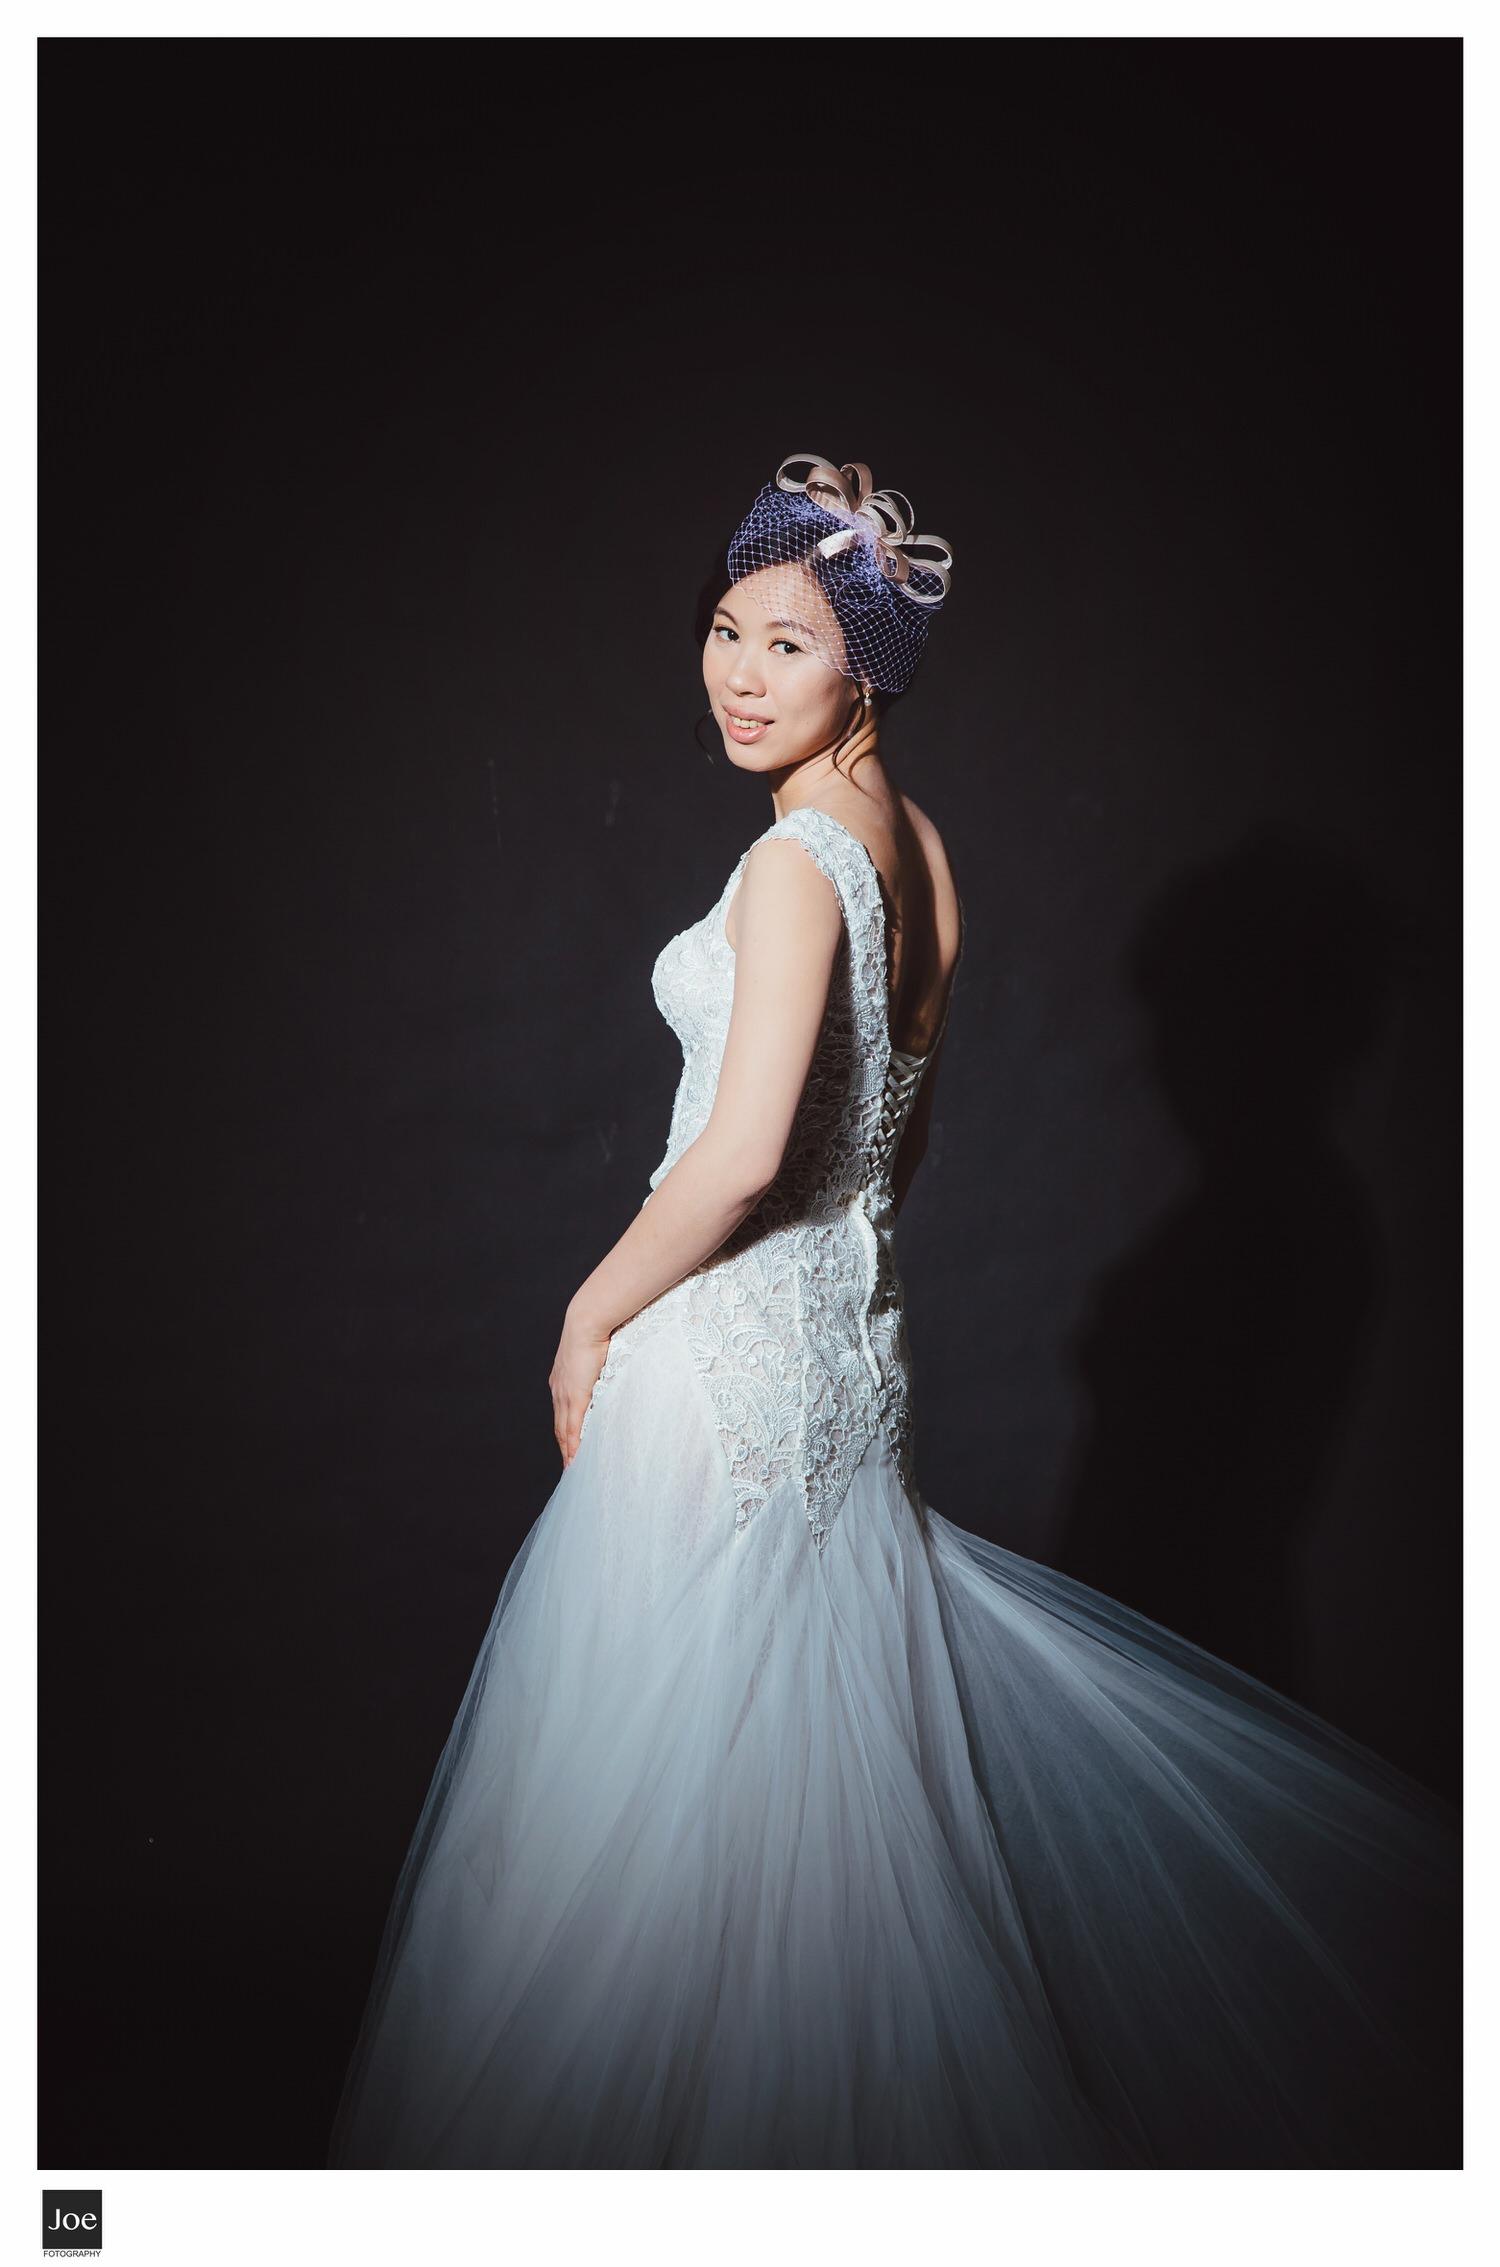 joe-fotography-pre-wedding-kay-jeff-009.jpg